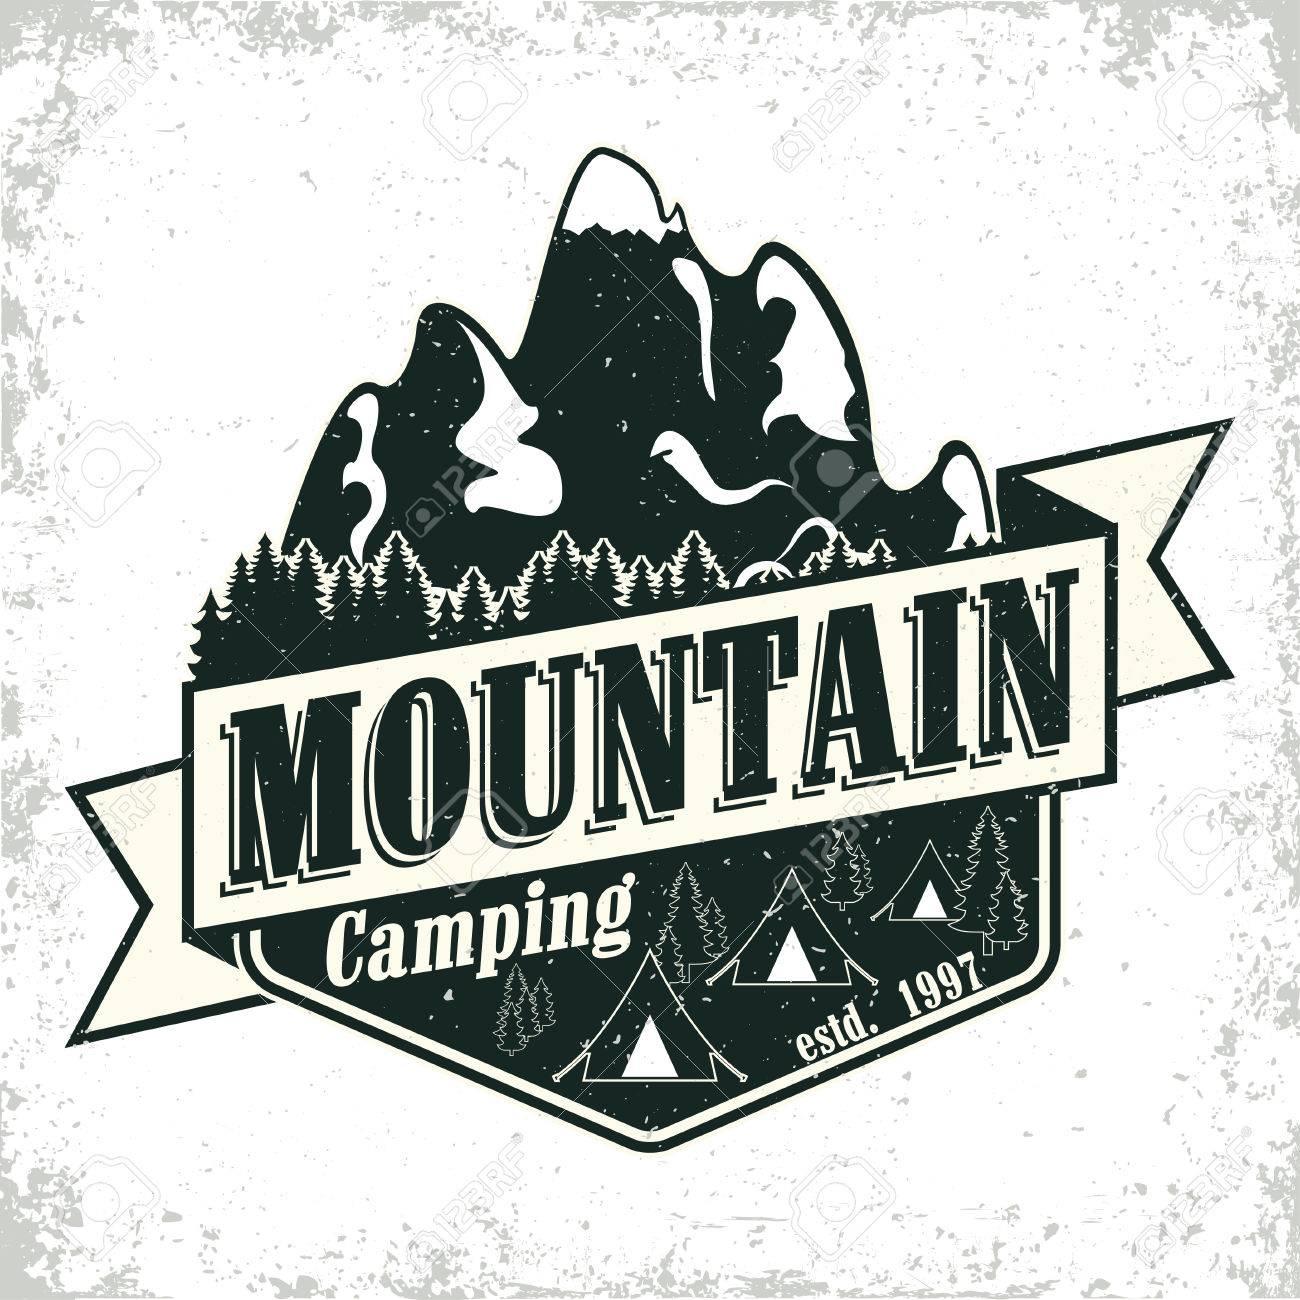 Vintage camping or tourism logo design, grange print stamp,